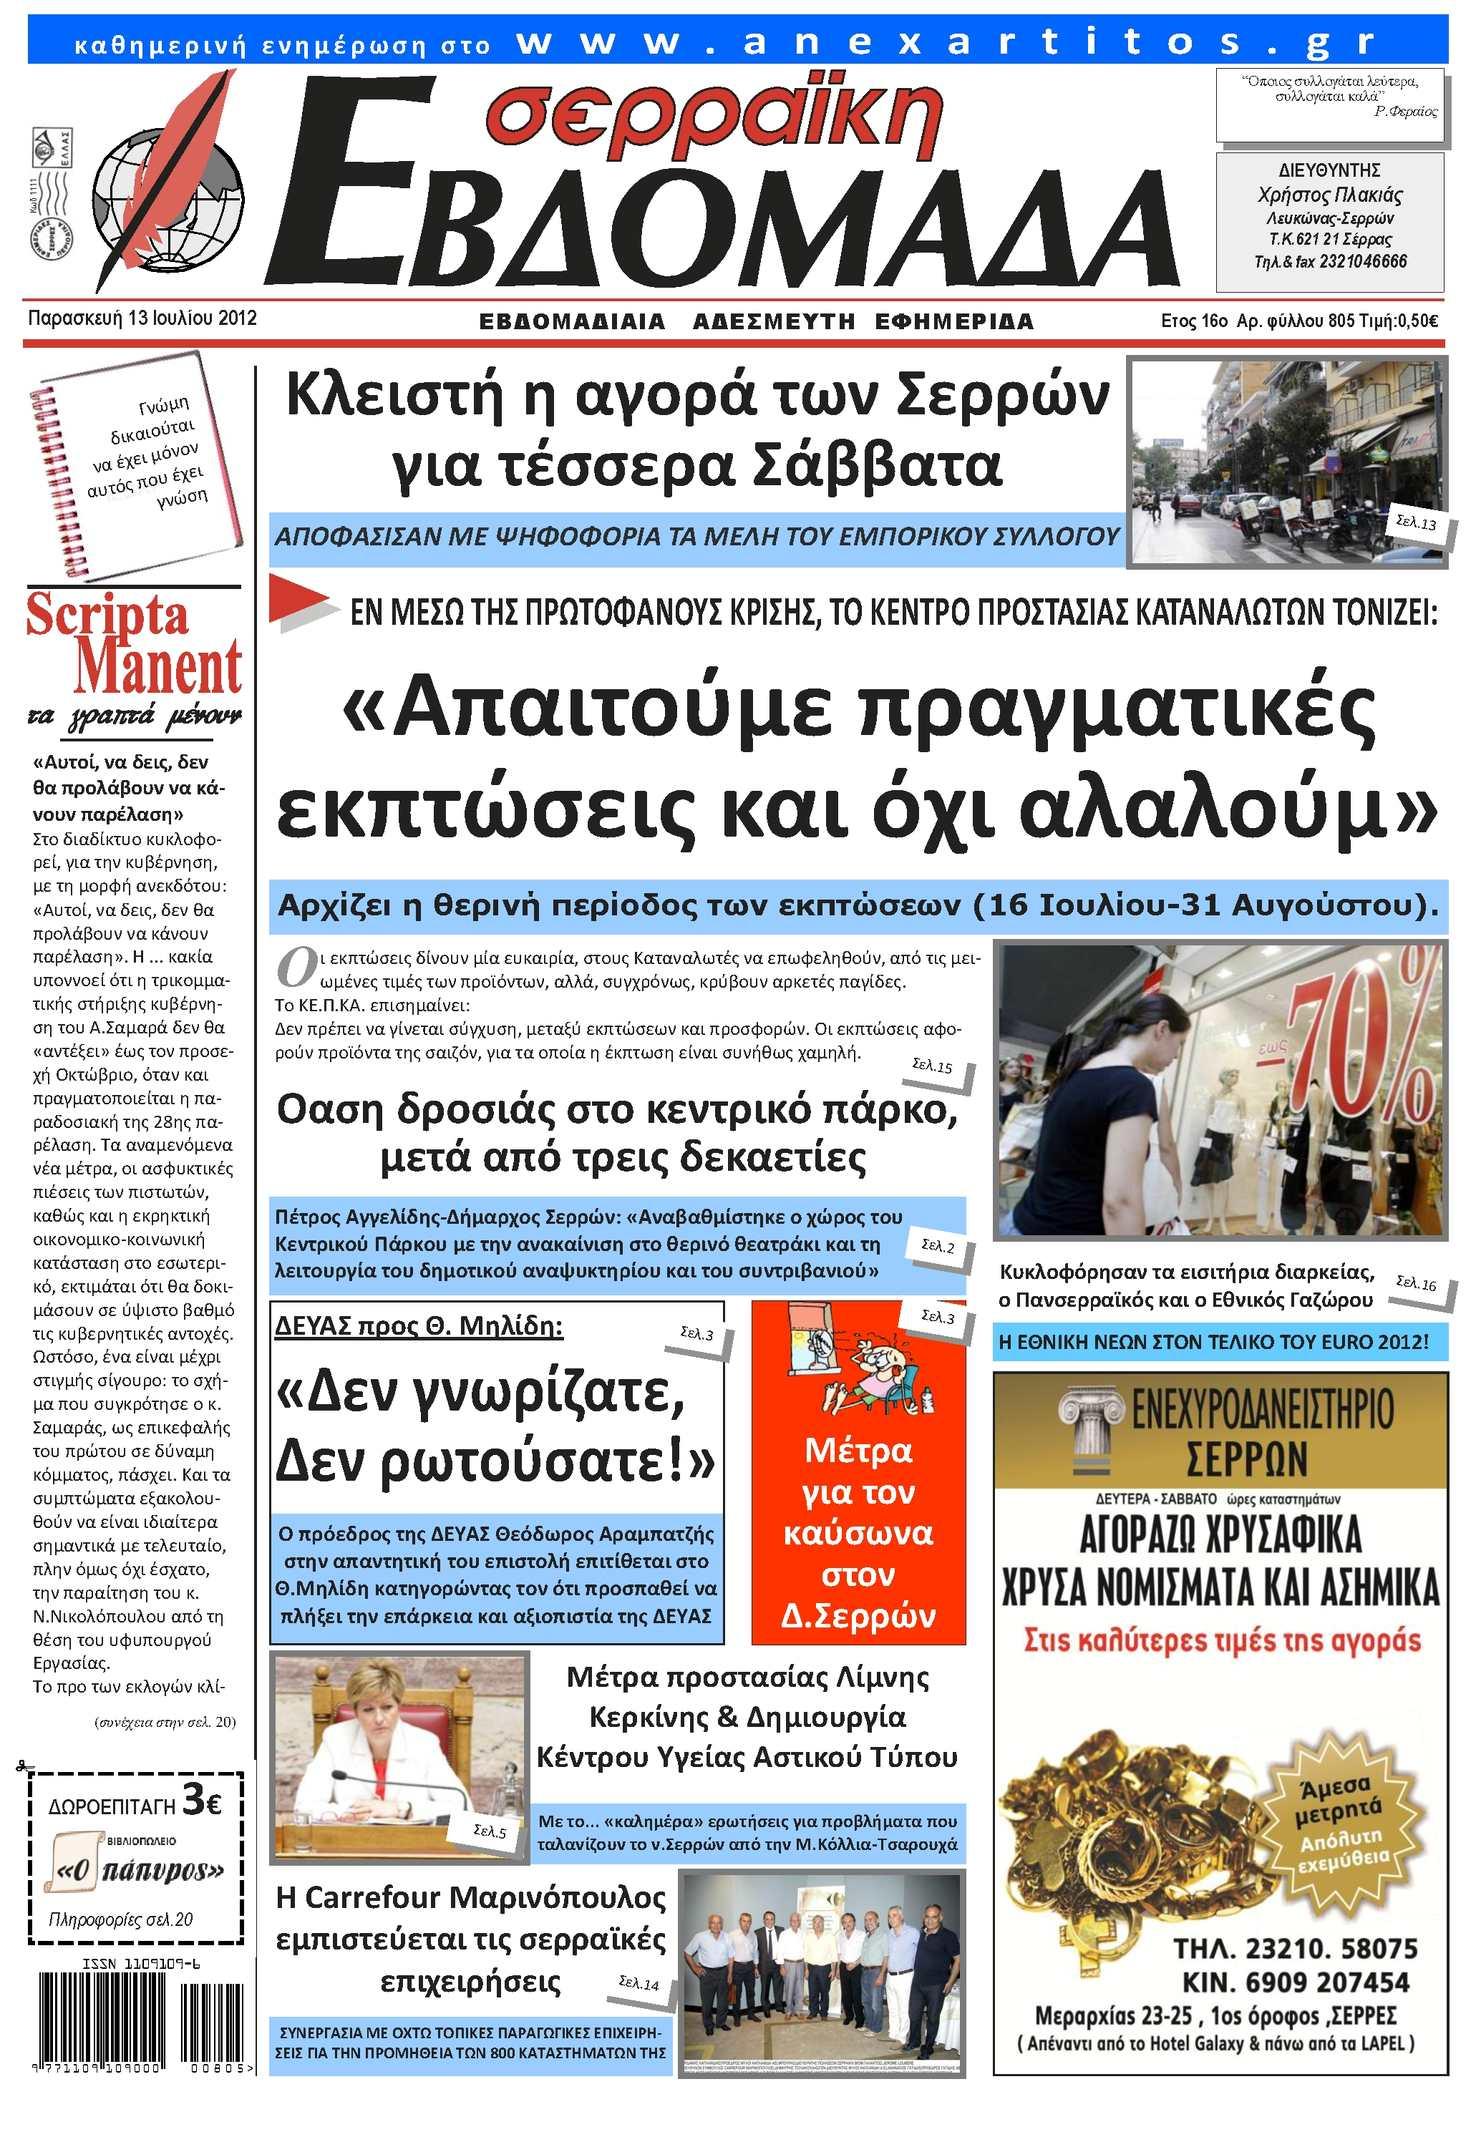 Calaméo - σερραϊκή ΕΒΔΟΜΑΔΑ 13-7-2012 c6dea81178c